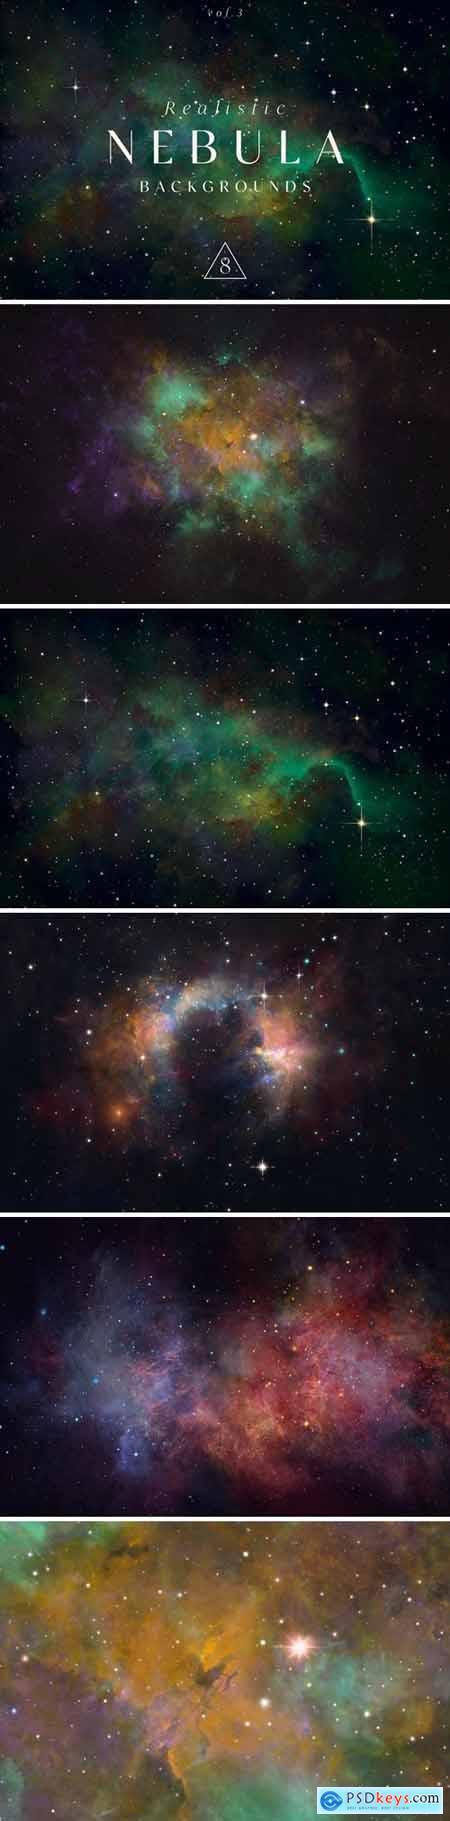 Realistic Nebula Backgrounds 3